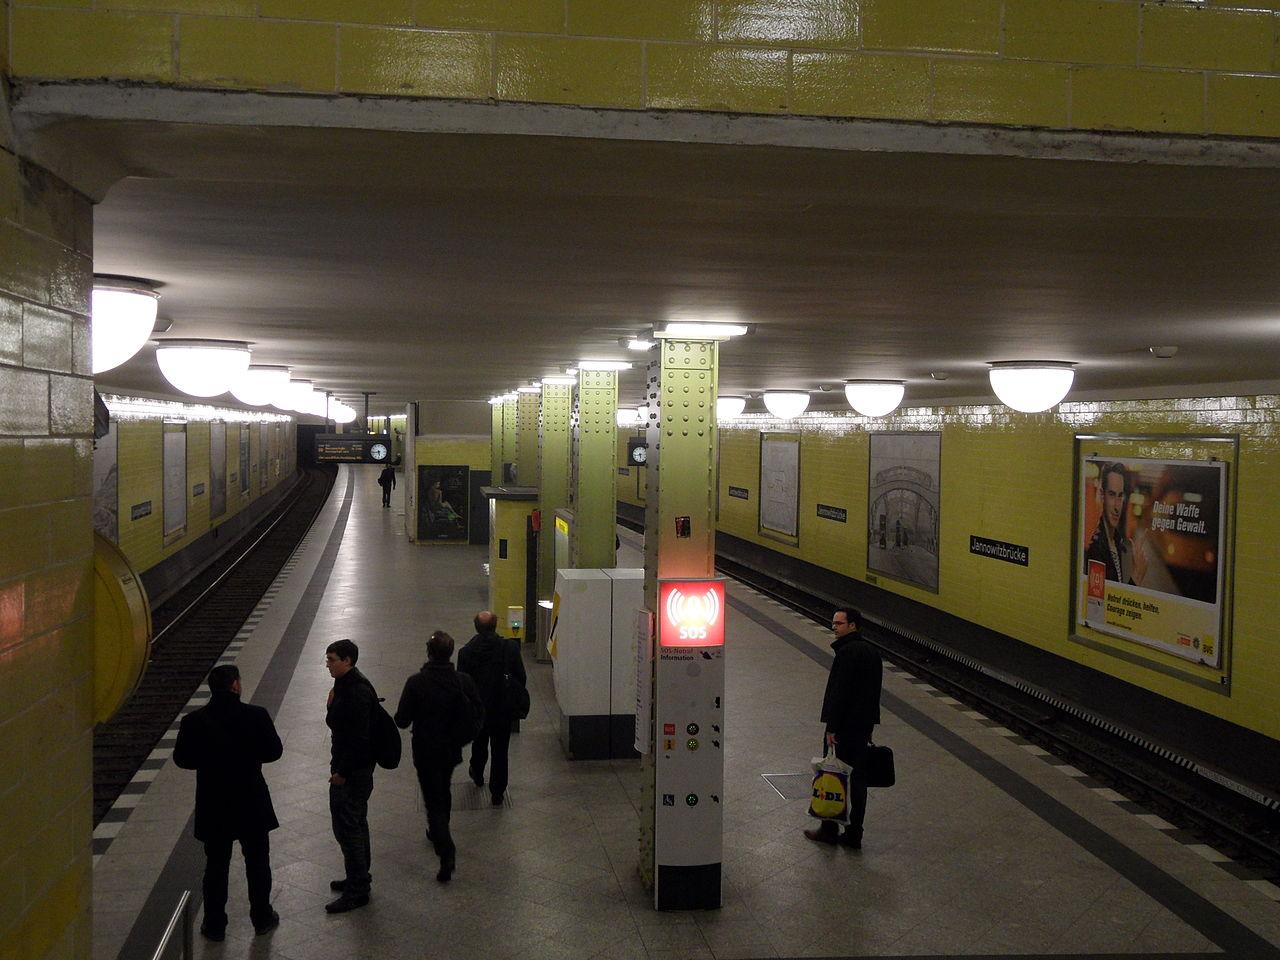 Bahnhof Zoologischer Garten Berlin Elegant File Berlin U Bahnhof Jannowitzbrücke Linie U8